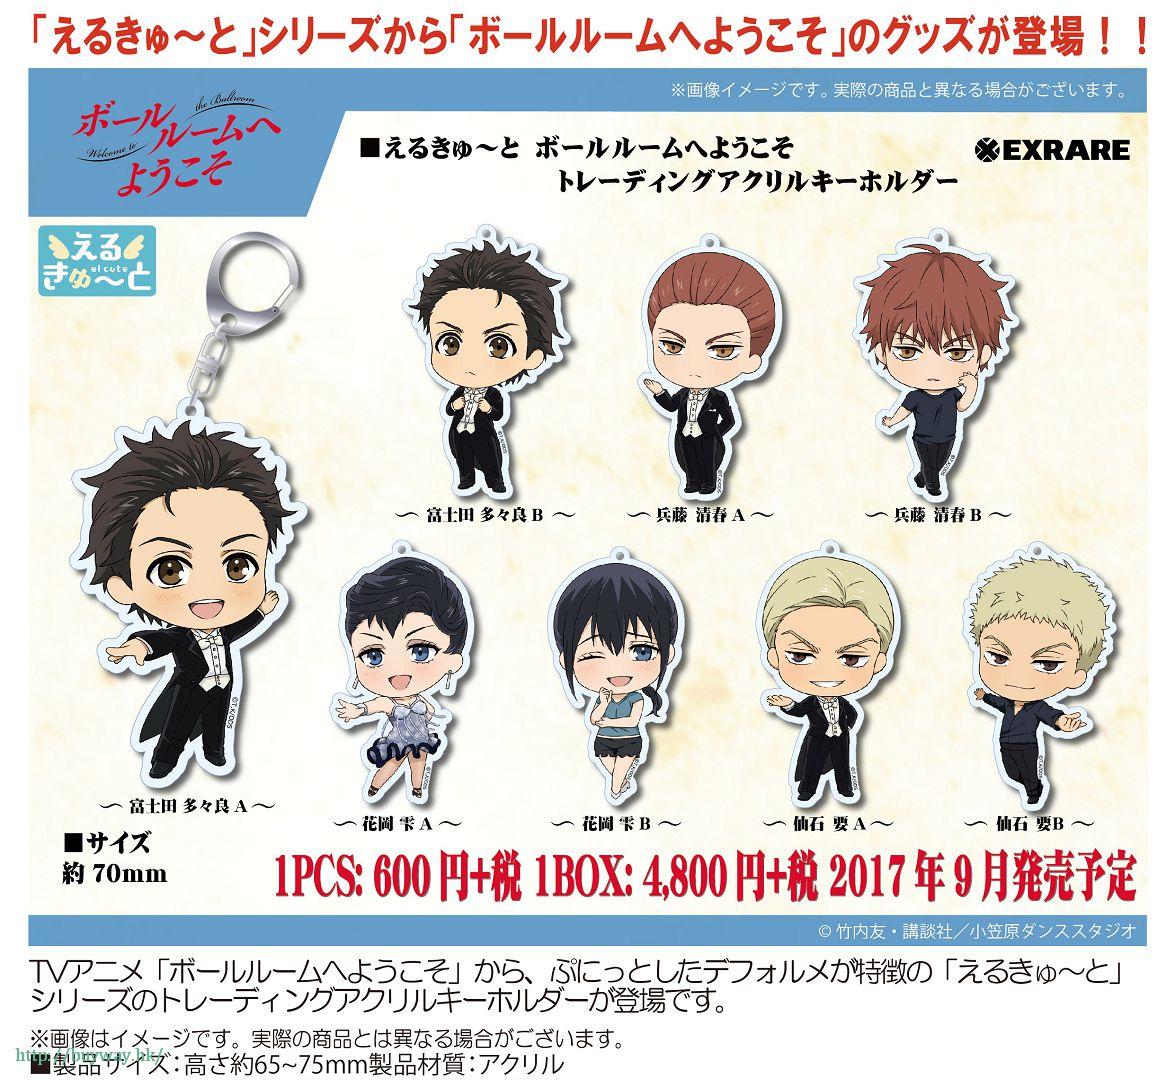 舞動青春 亞克力匙扣 (8 個入) el cute Acrylic Key Chain (8 Pieces)【Welcome to the Ballroom】